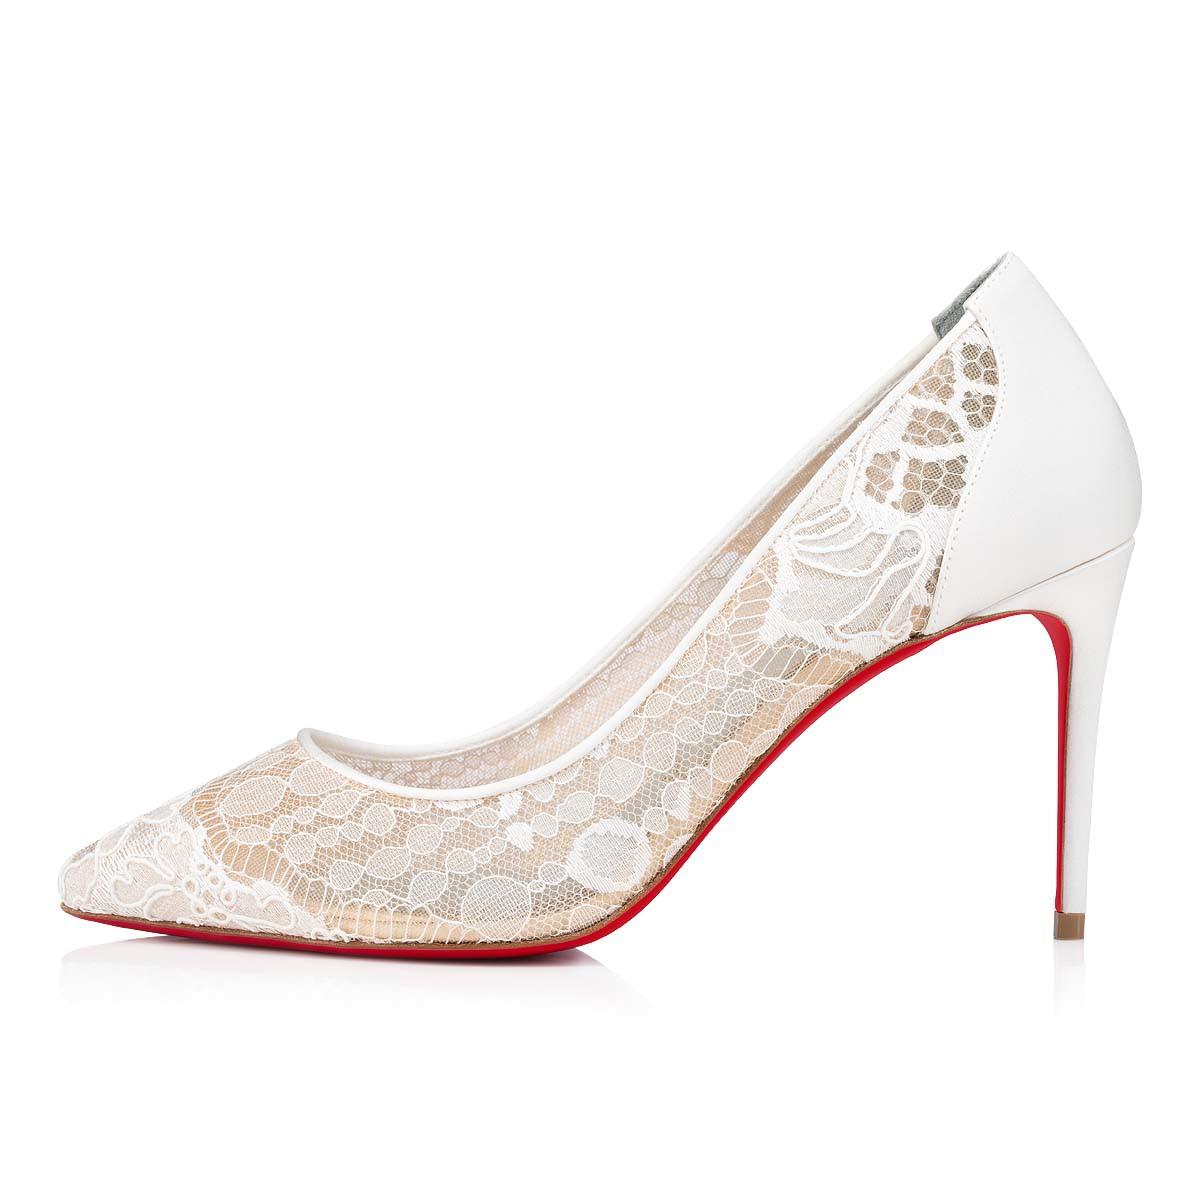 鞋履 - Follies Lace - Christian Louboutin